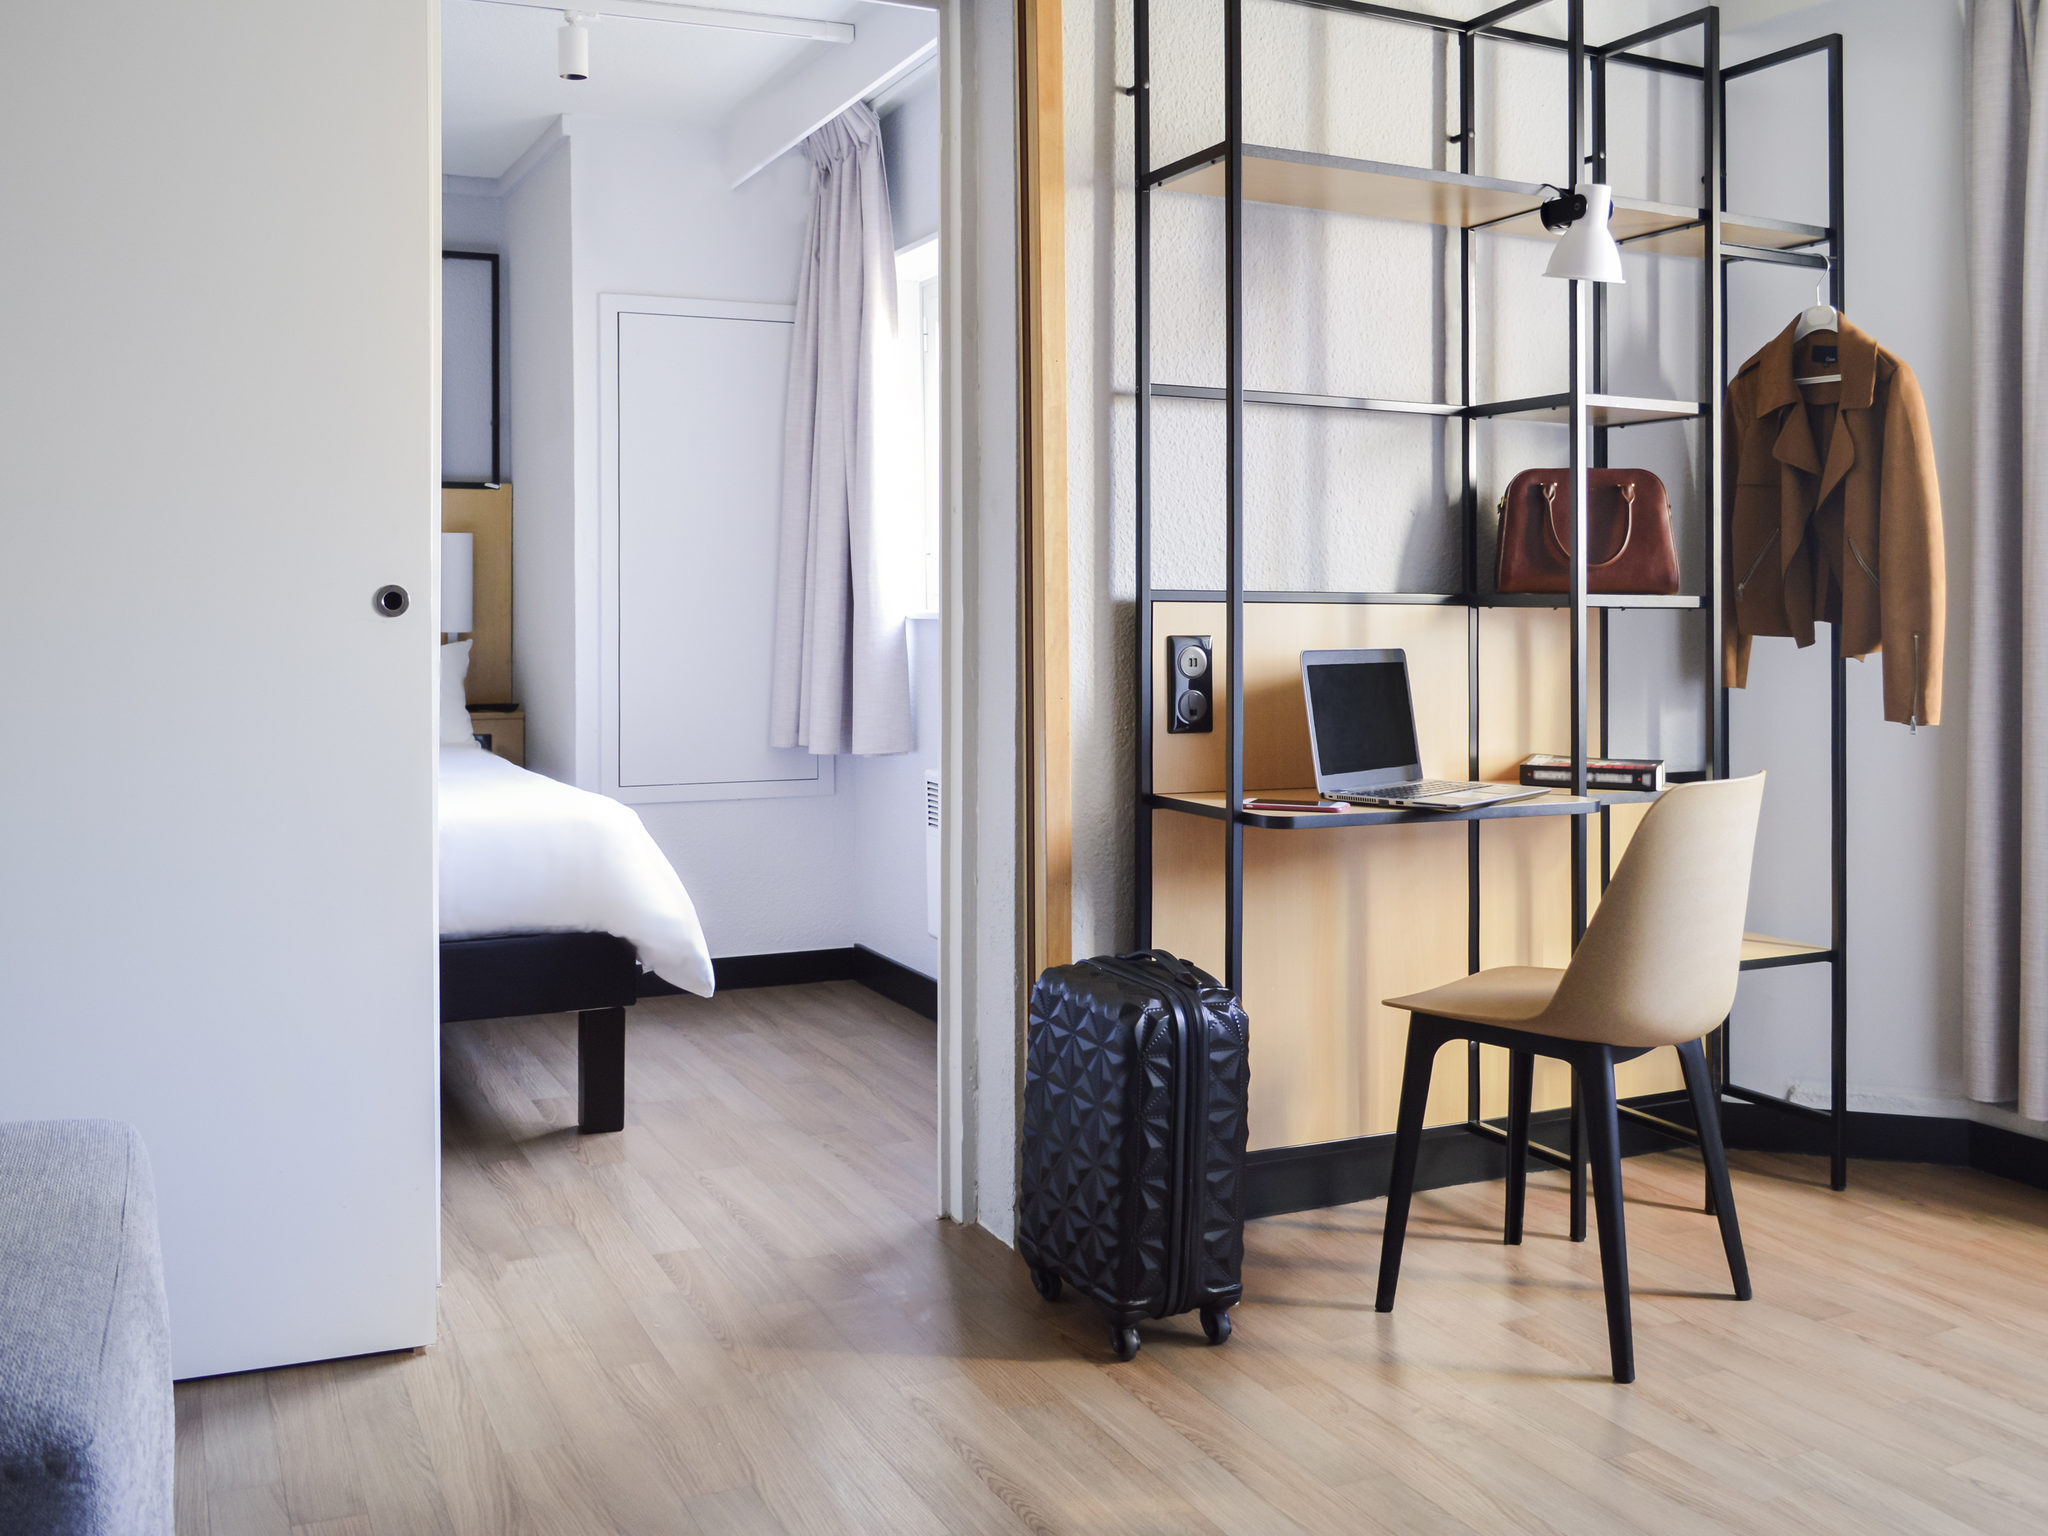 Hotel Ibis Paris Eiffelturm Cambronne